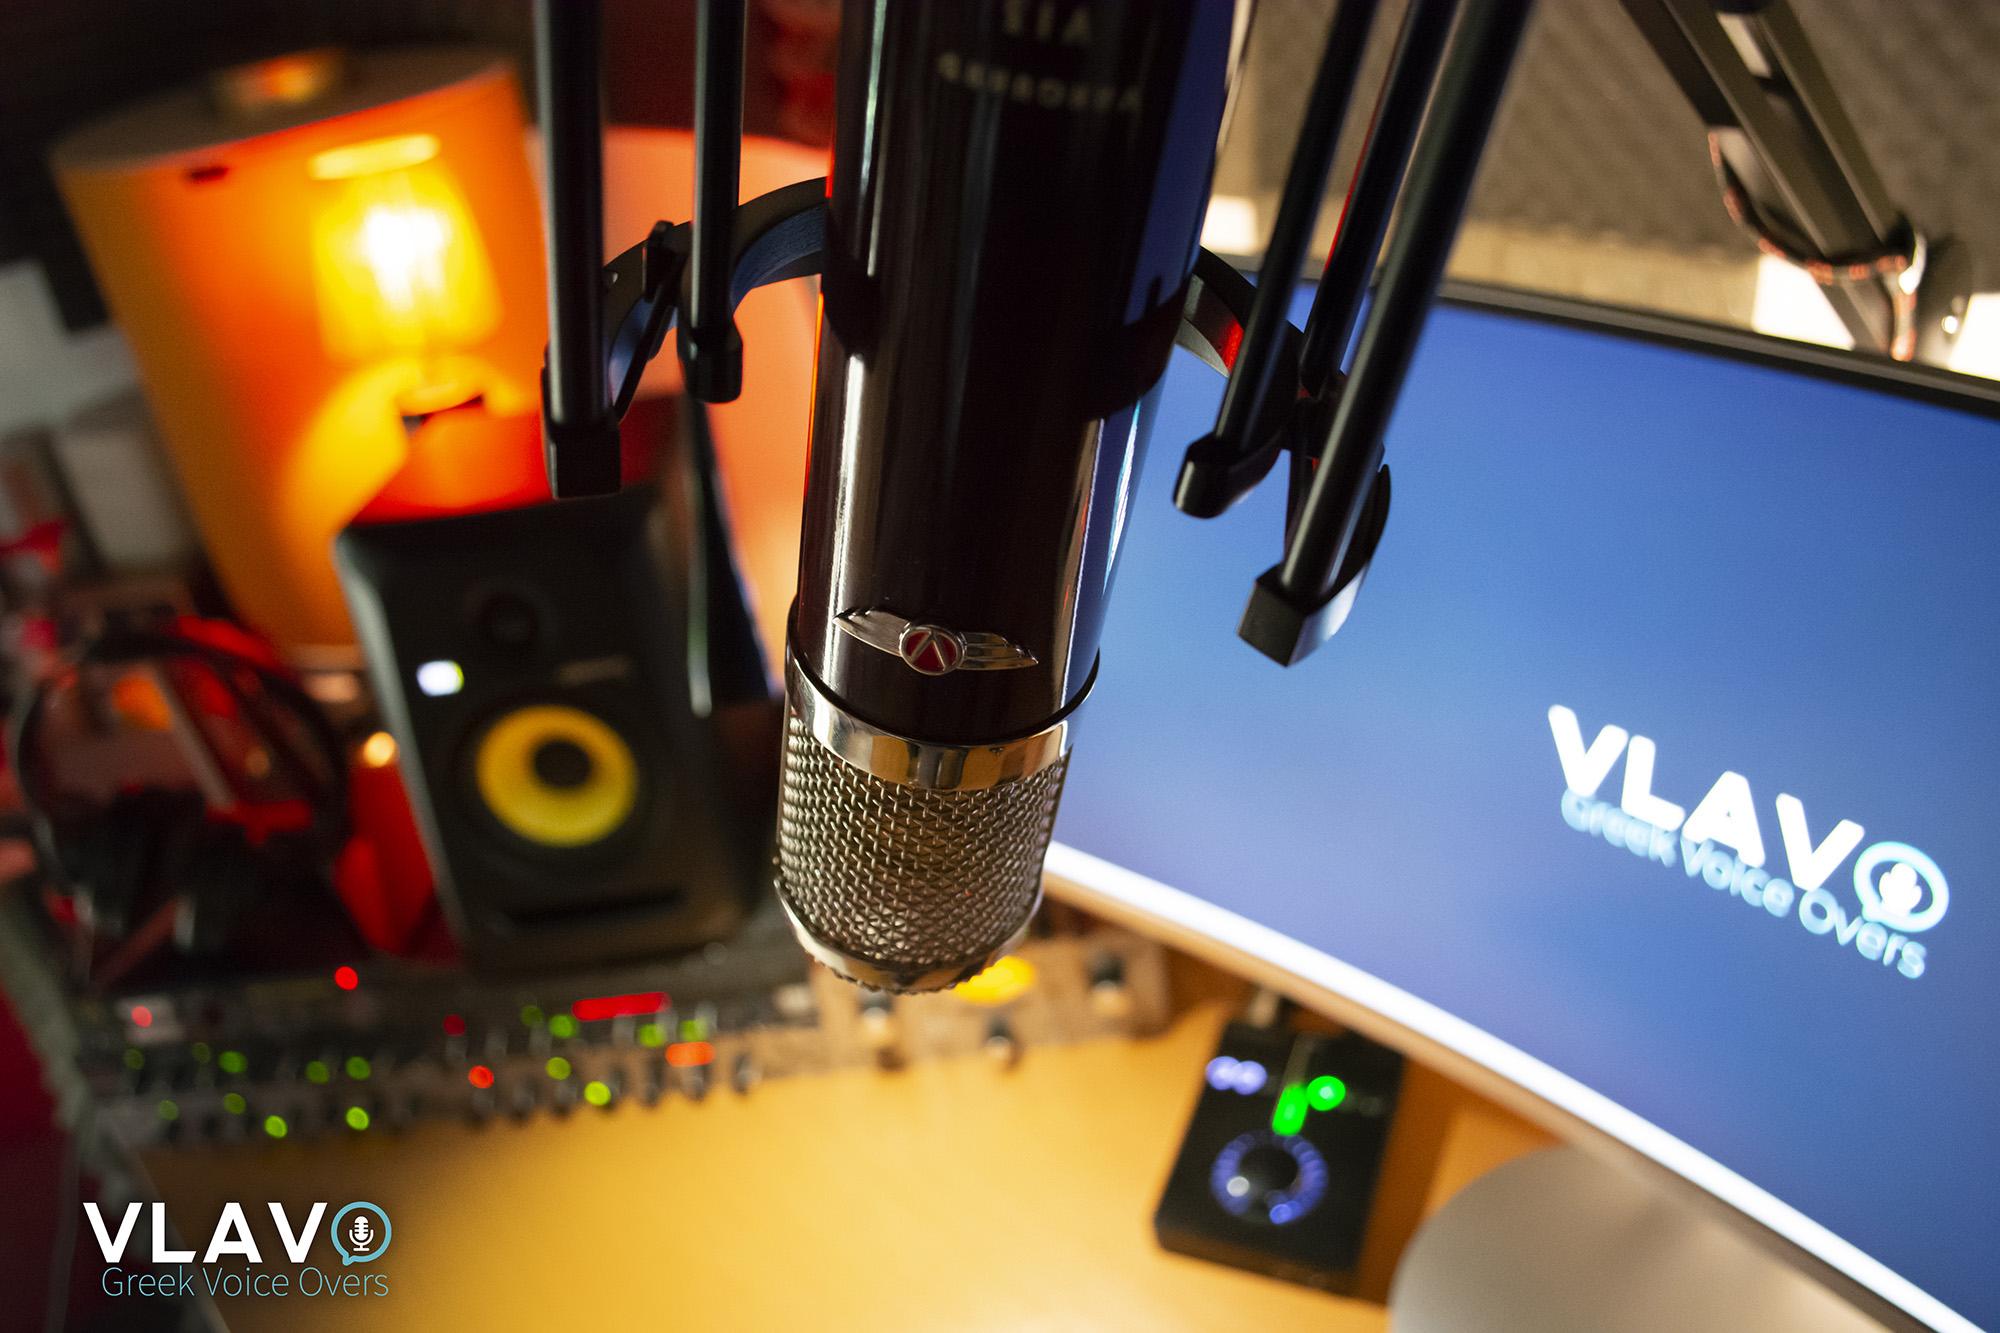 VLAVO-GREEK-VOICE-OVERS-MICS-V13-web